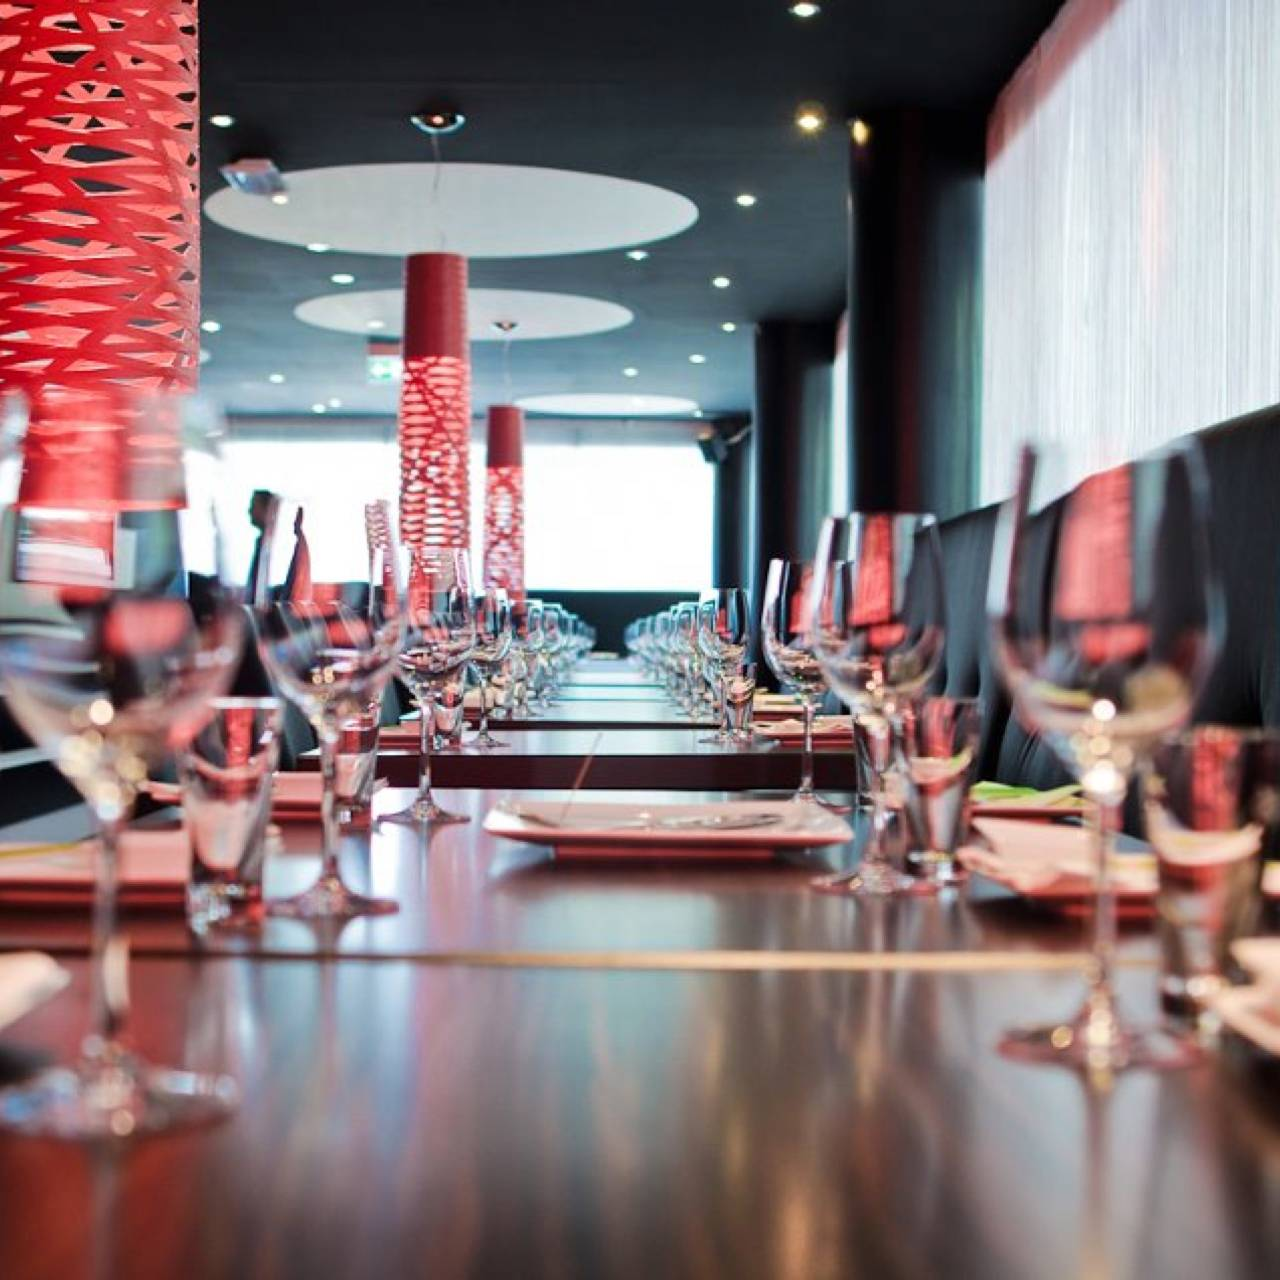 Tokyo Lounge Restaurant Dusseldorf Nw Opentable